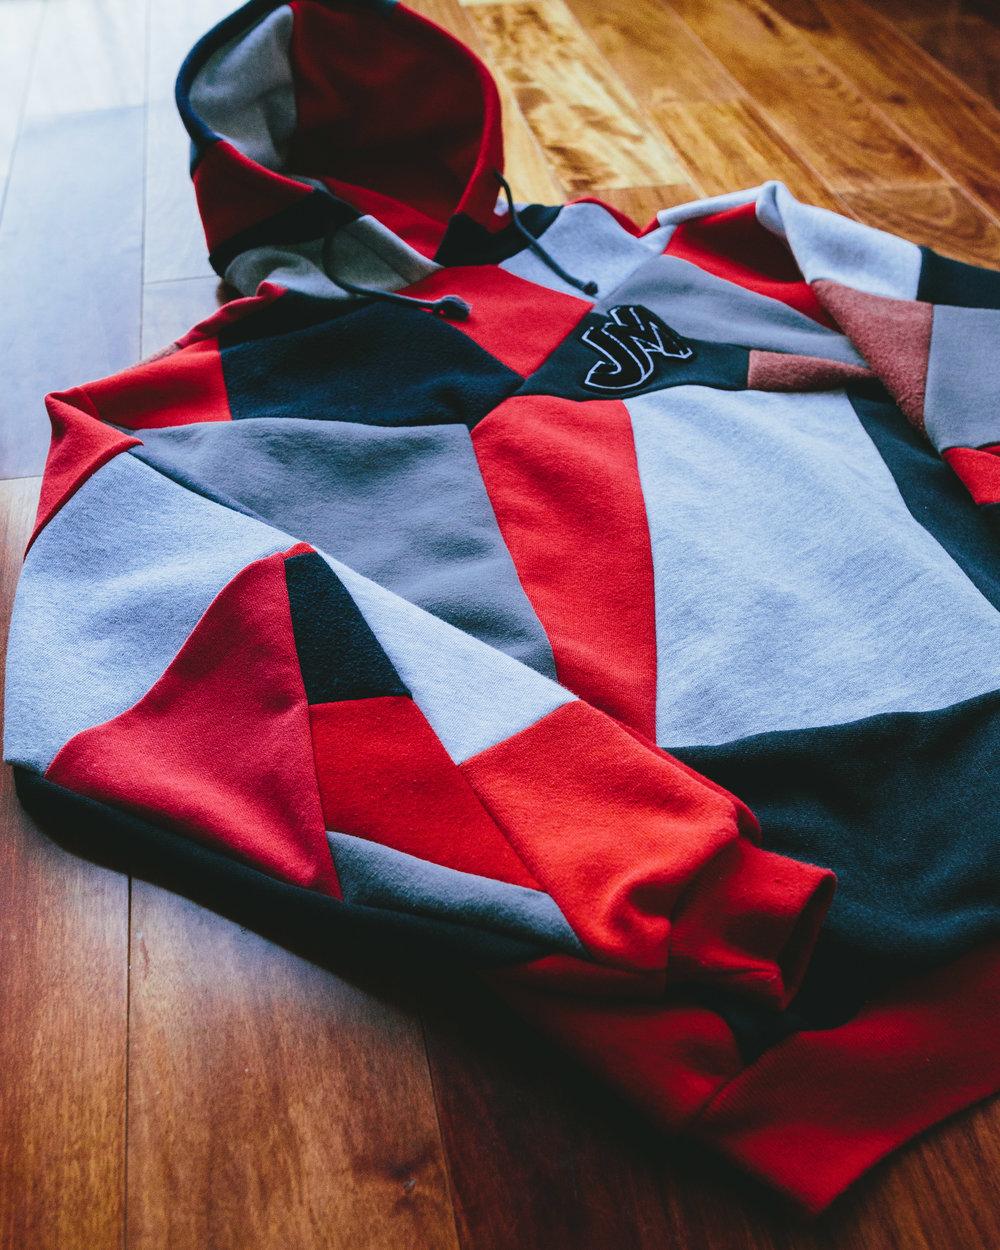 jmsweater-1001.jpg